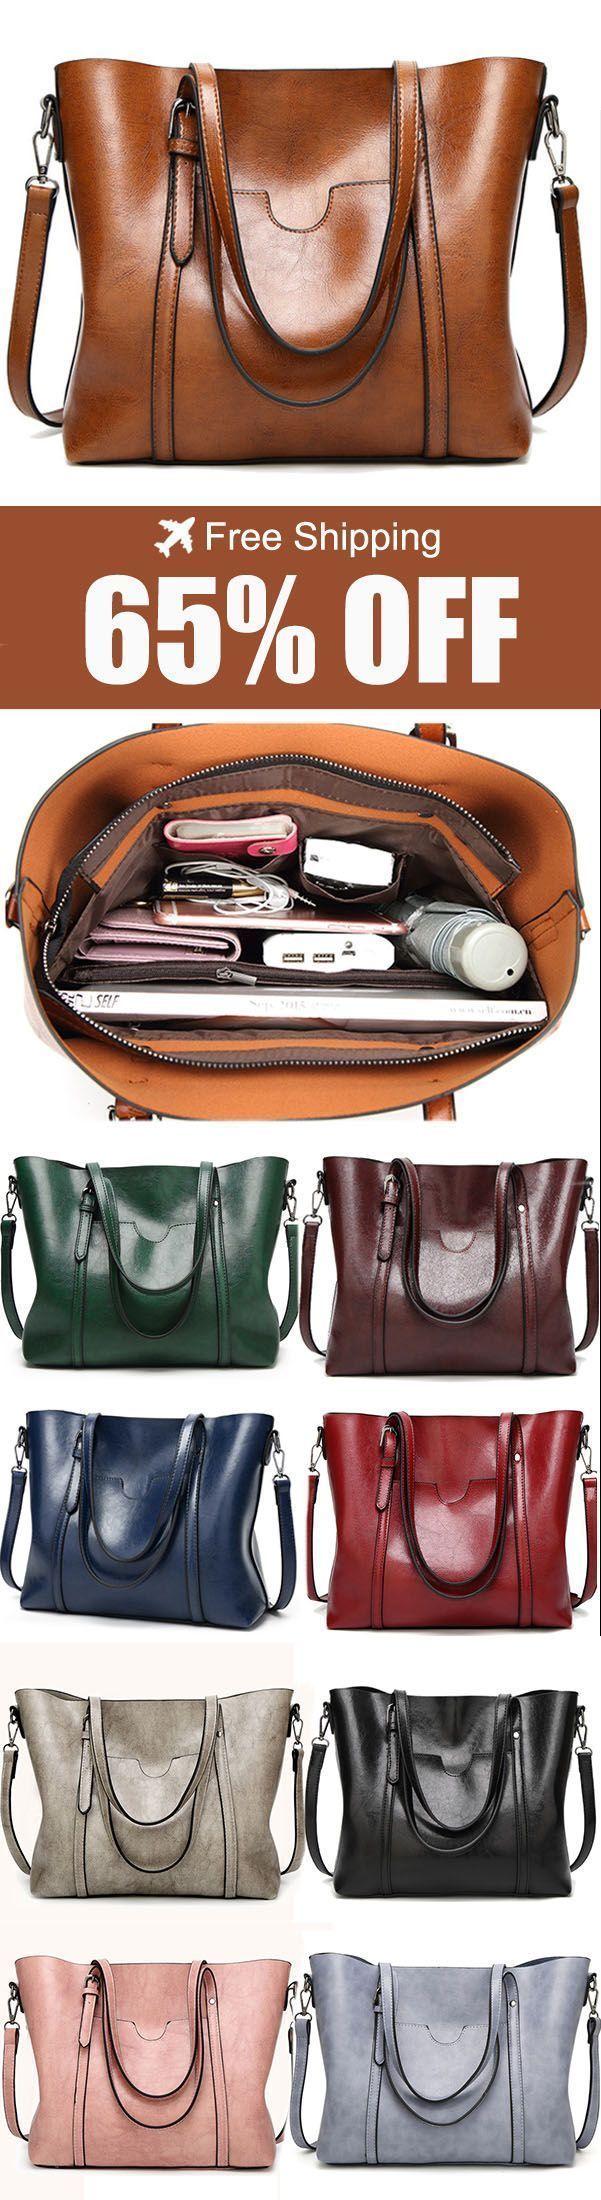 Women Tote Handbags Vintage Front Pocket Shoulder Bags Large Capacity Crossbody Bags. #fashion #bags